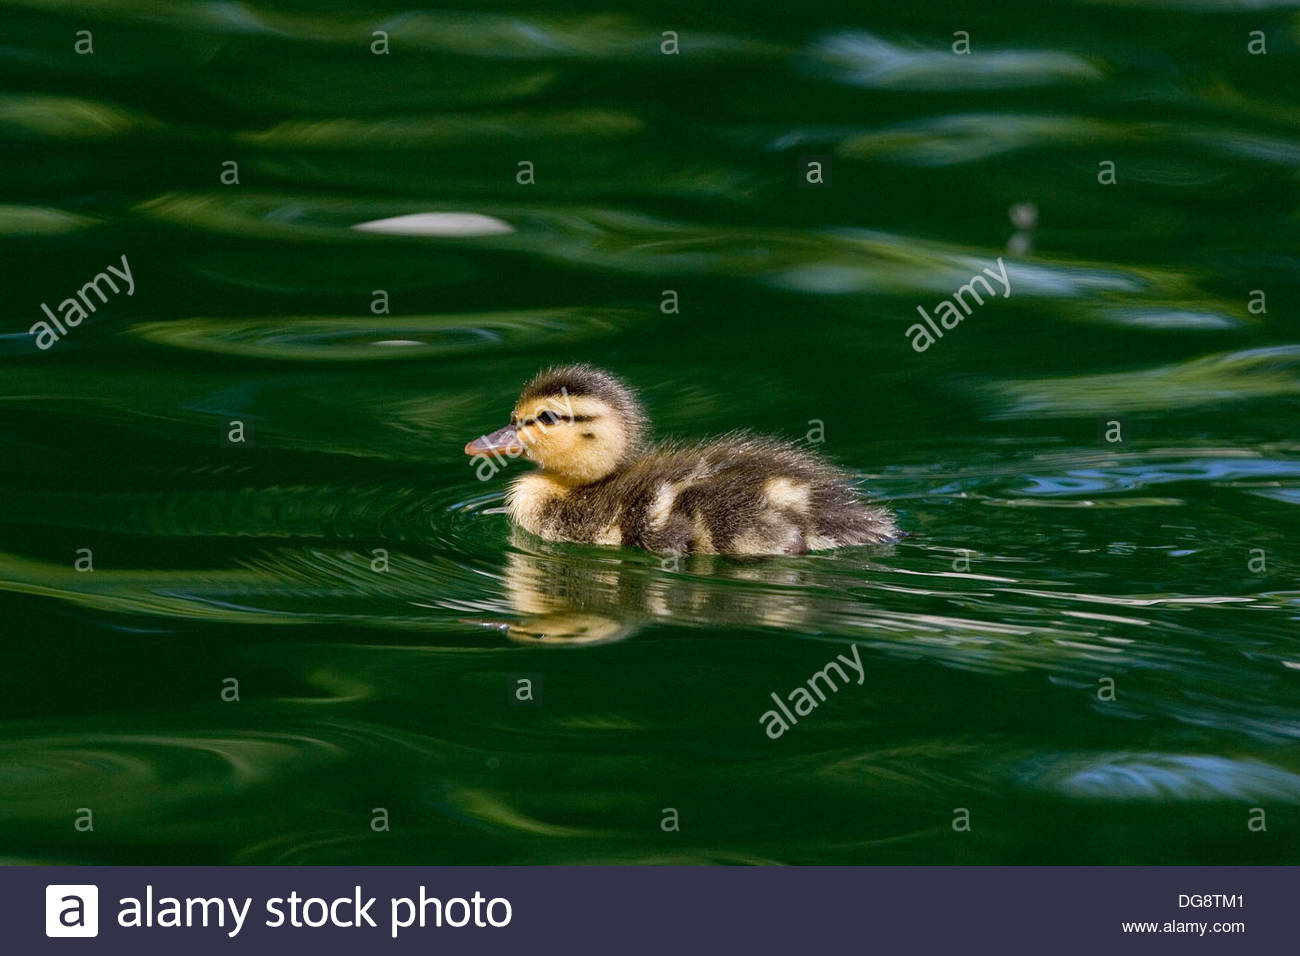 Mallard Duck, Anas platyrhynchos - Stock Image